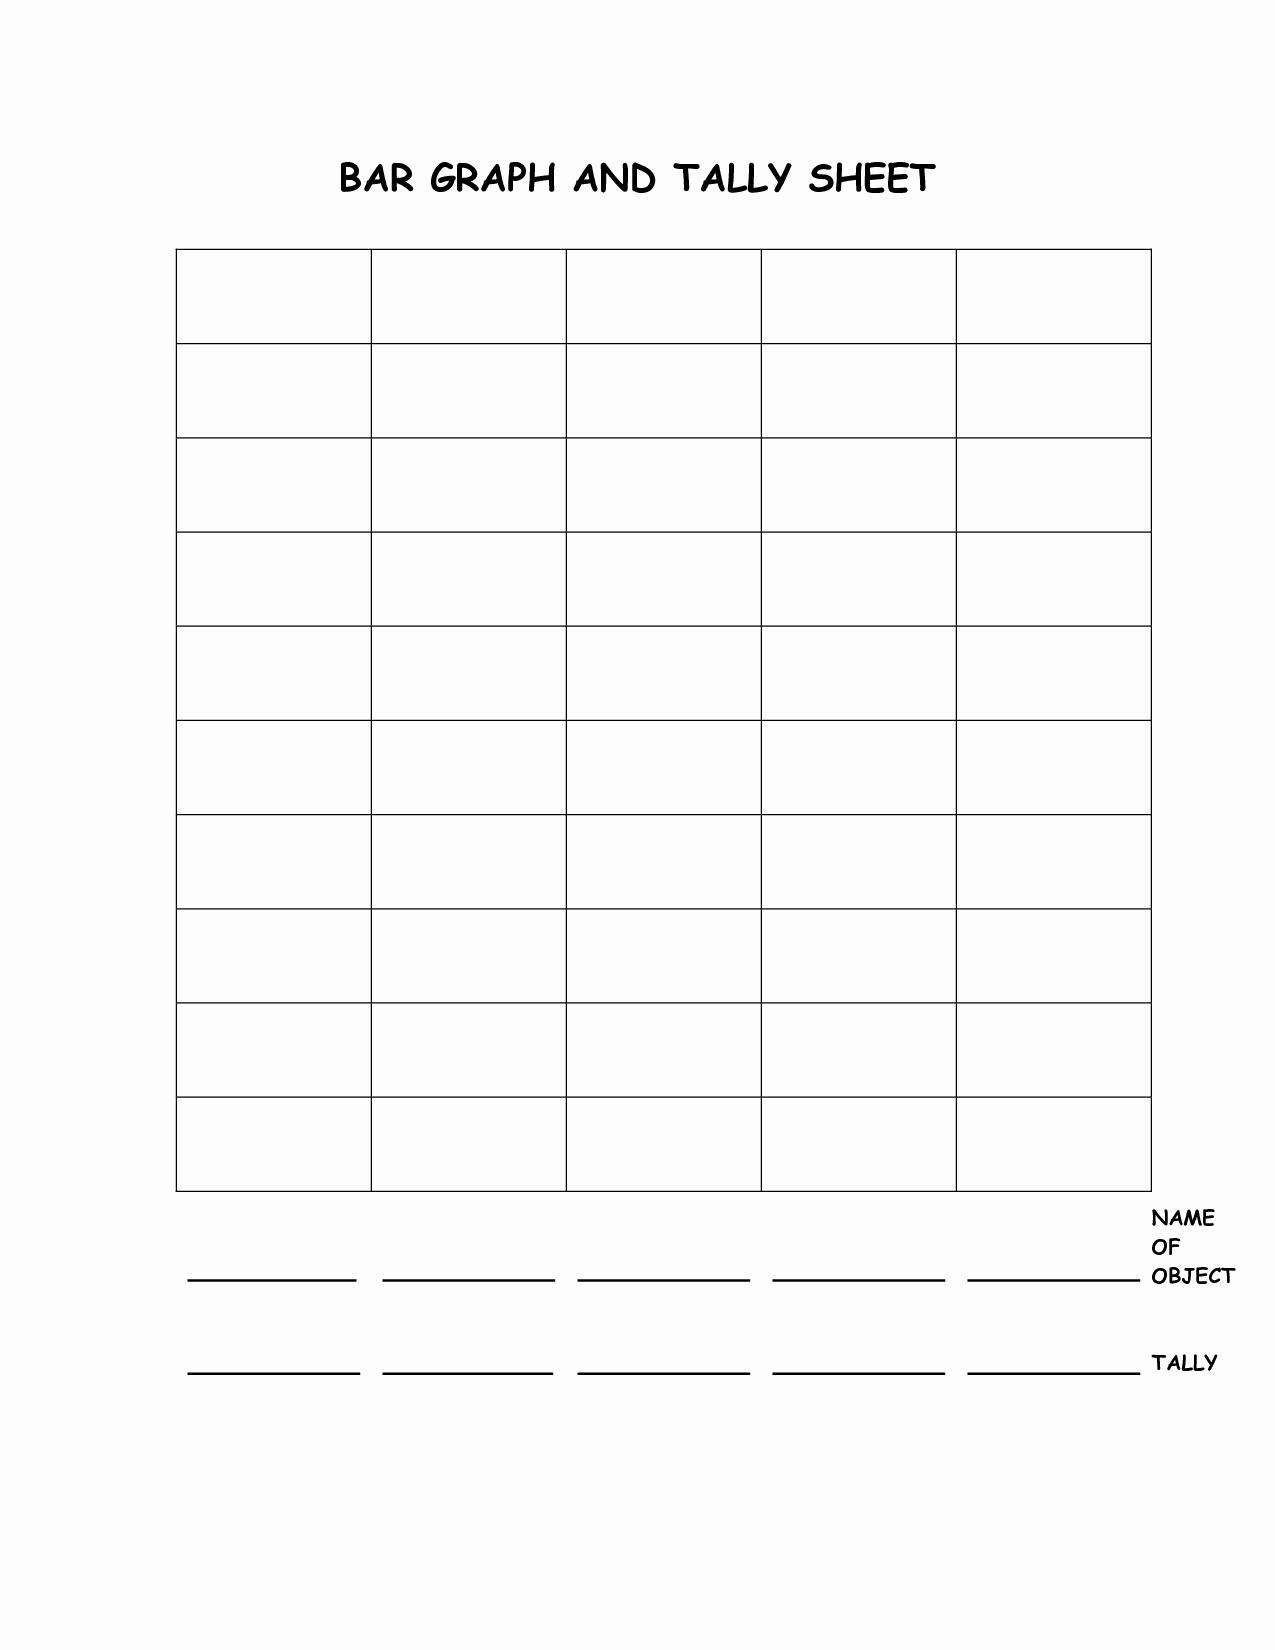 Blank Bar Graph Template Awesome Blank Bar Graph Templates Portablegasgrillweber